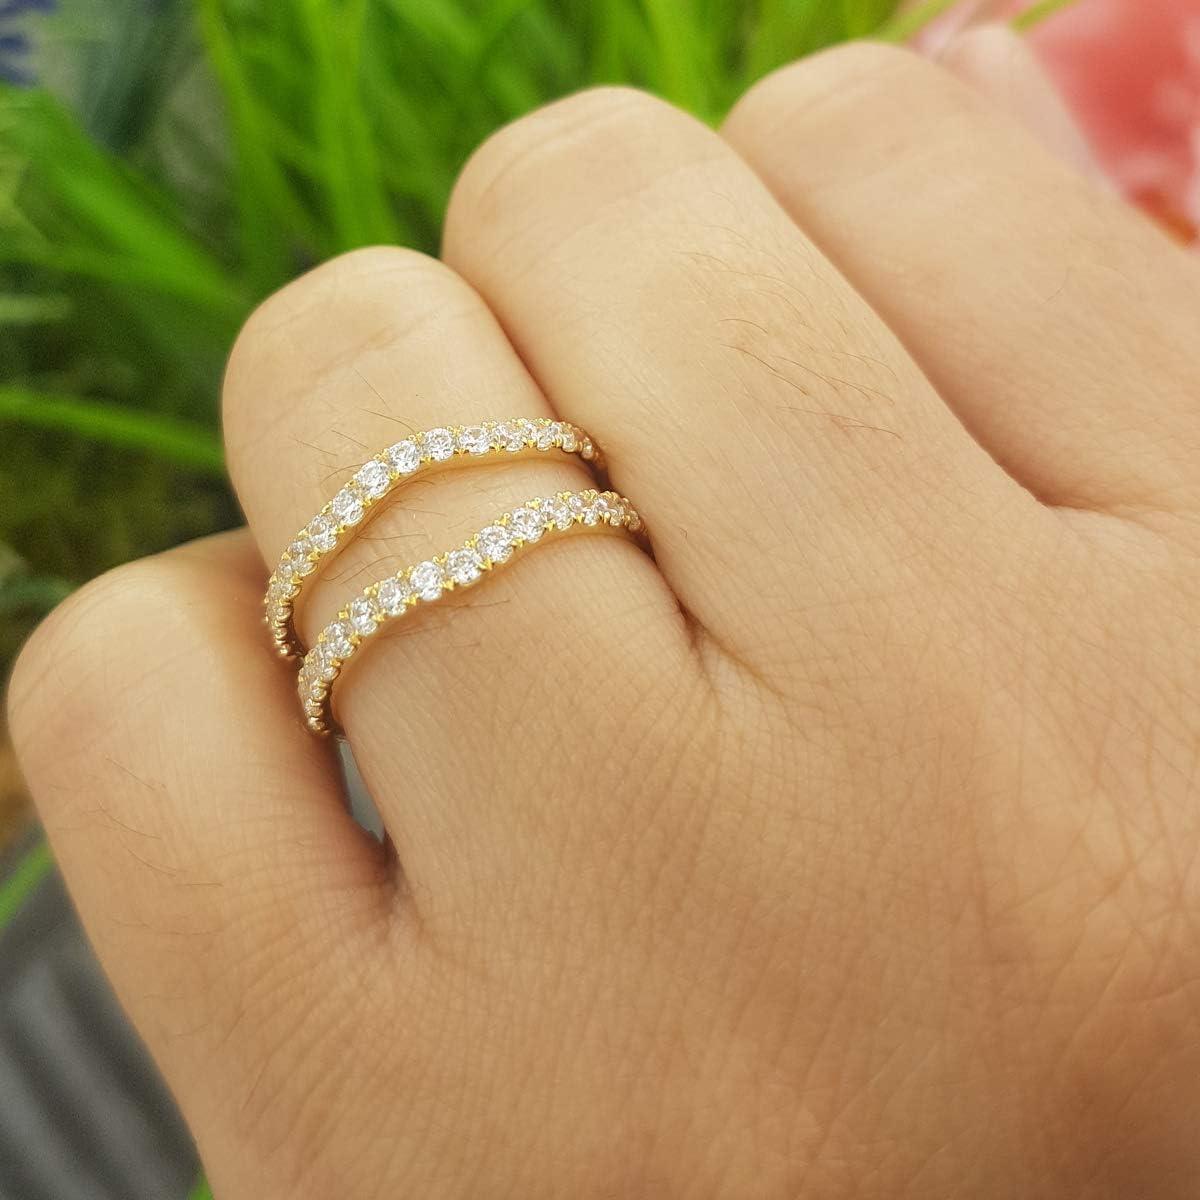 DazzlingRock Collection 1.60 Carat 10K Gold Round White Cubic Zirconia Wedding Enhancer Double Ring ctw